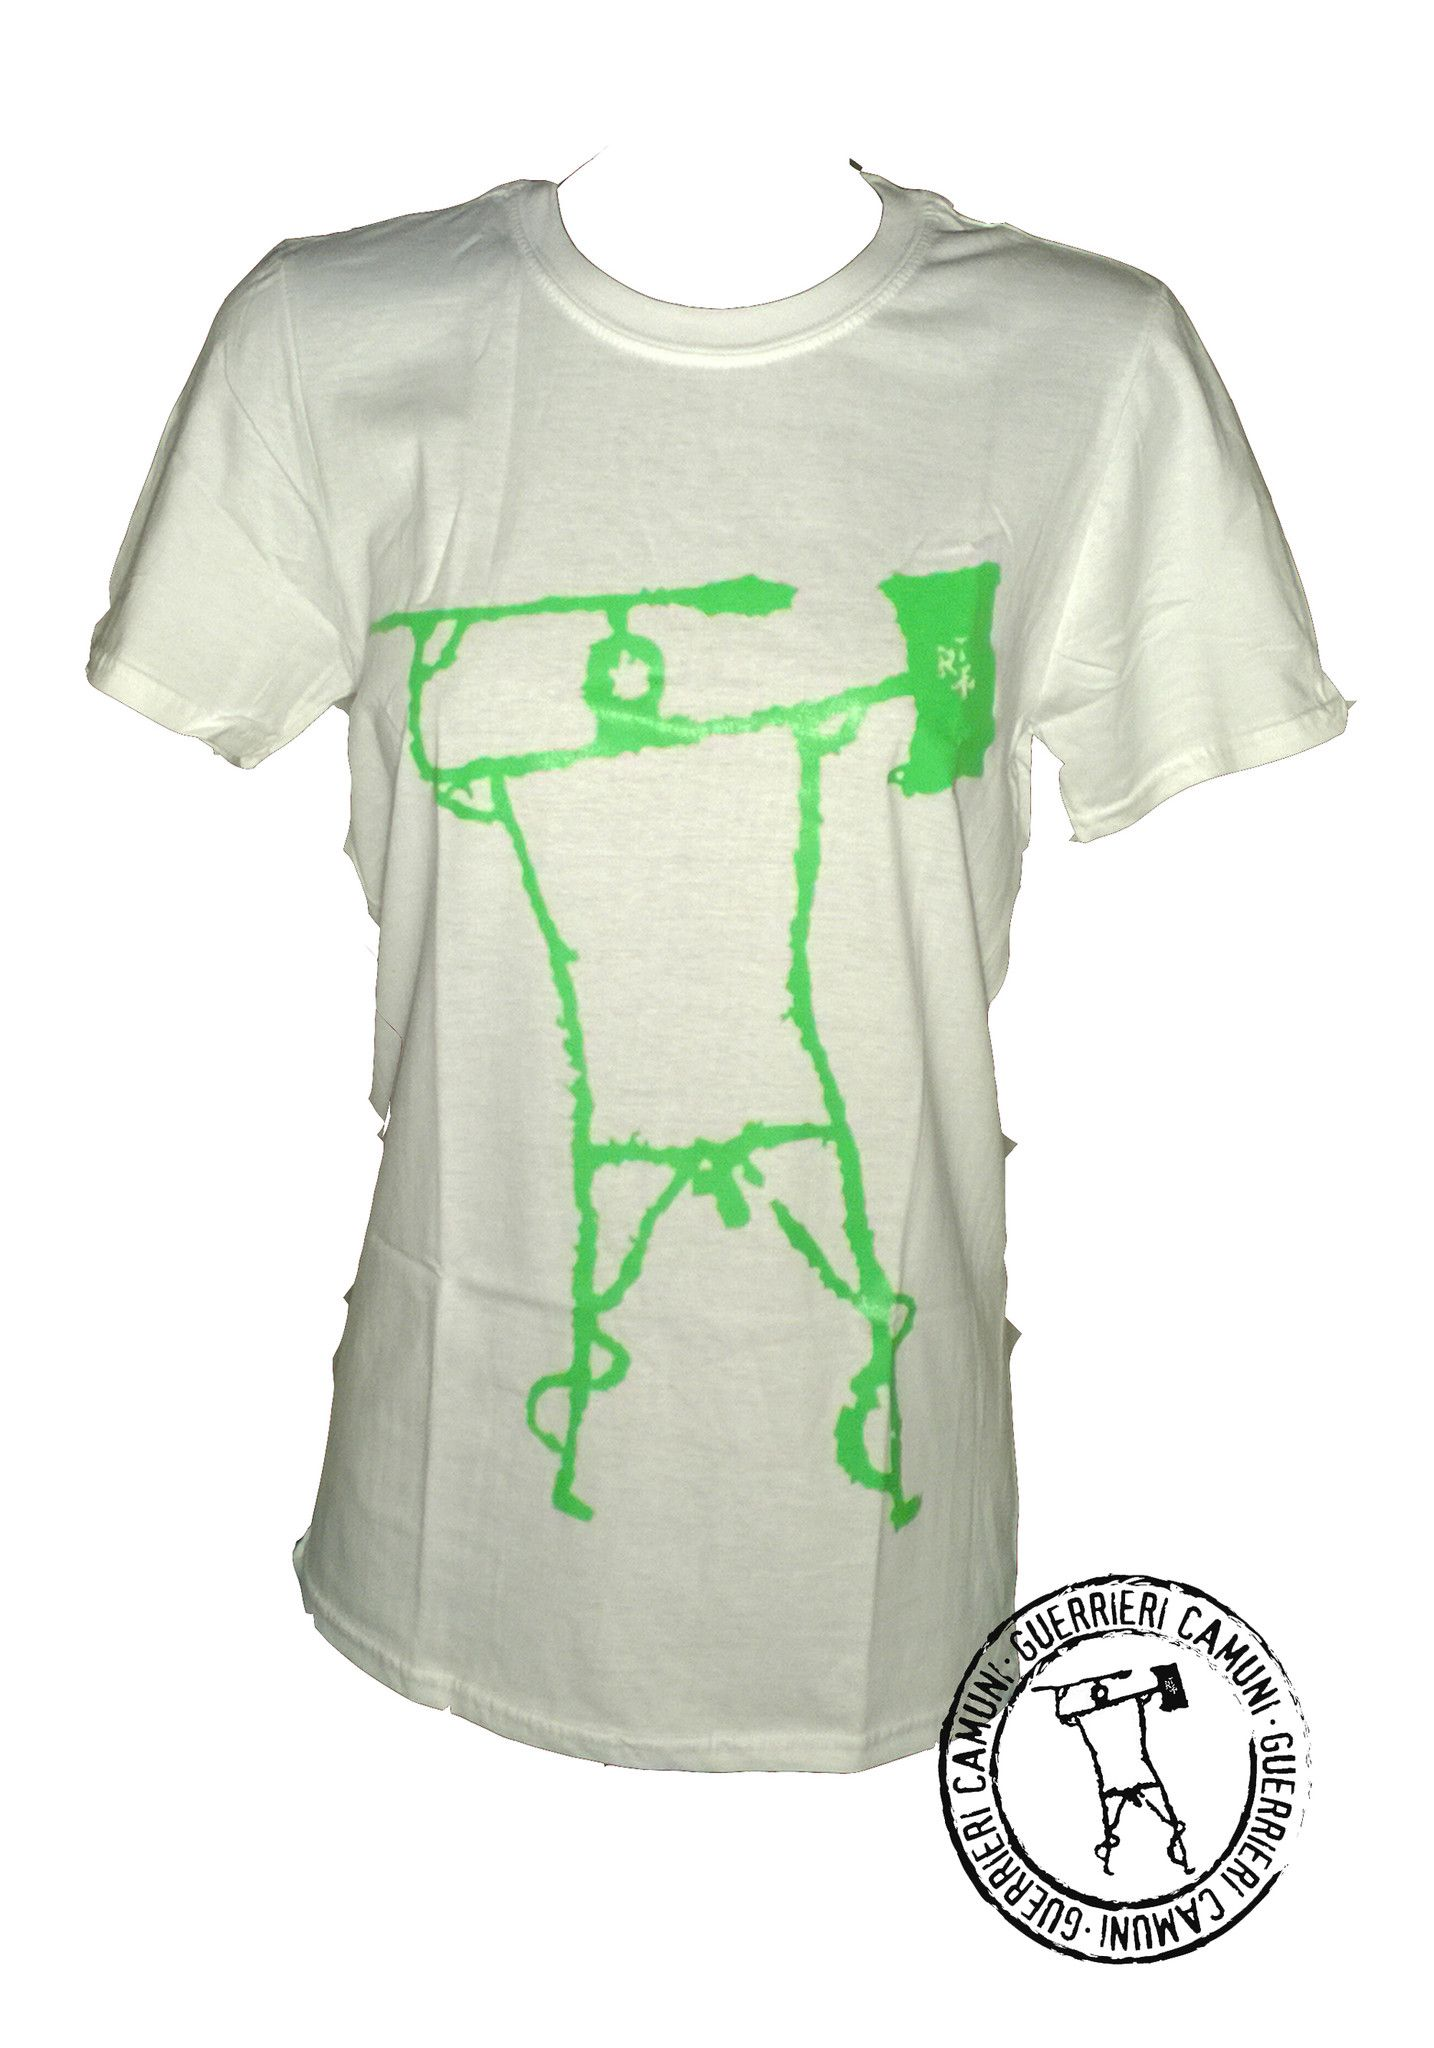 Maglietta T-Shirt Incisioni Rupestri Guerriero Camuno Verde Unisex Bianca